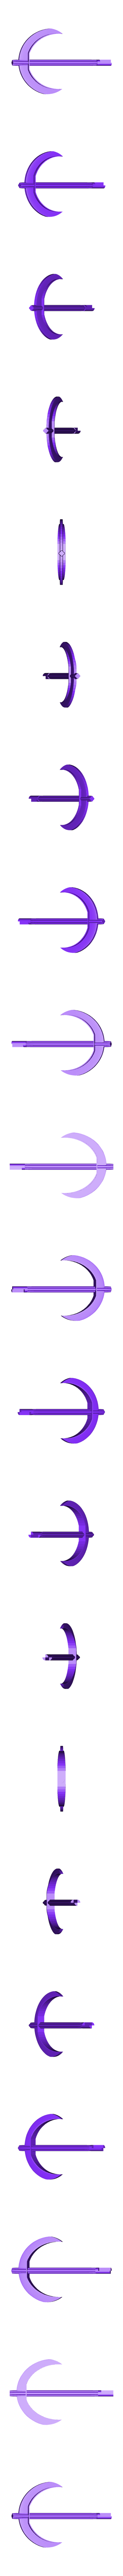 Asterohache Shogun Goldorak.stl Download free STL file wheel and wheel support and astero ax for shogun Goldorak • 3D printing model, stephane49